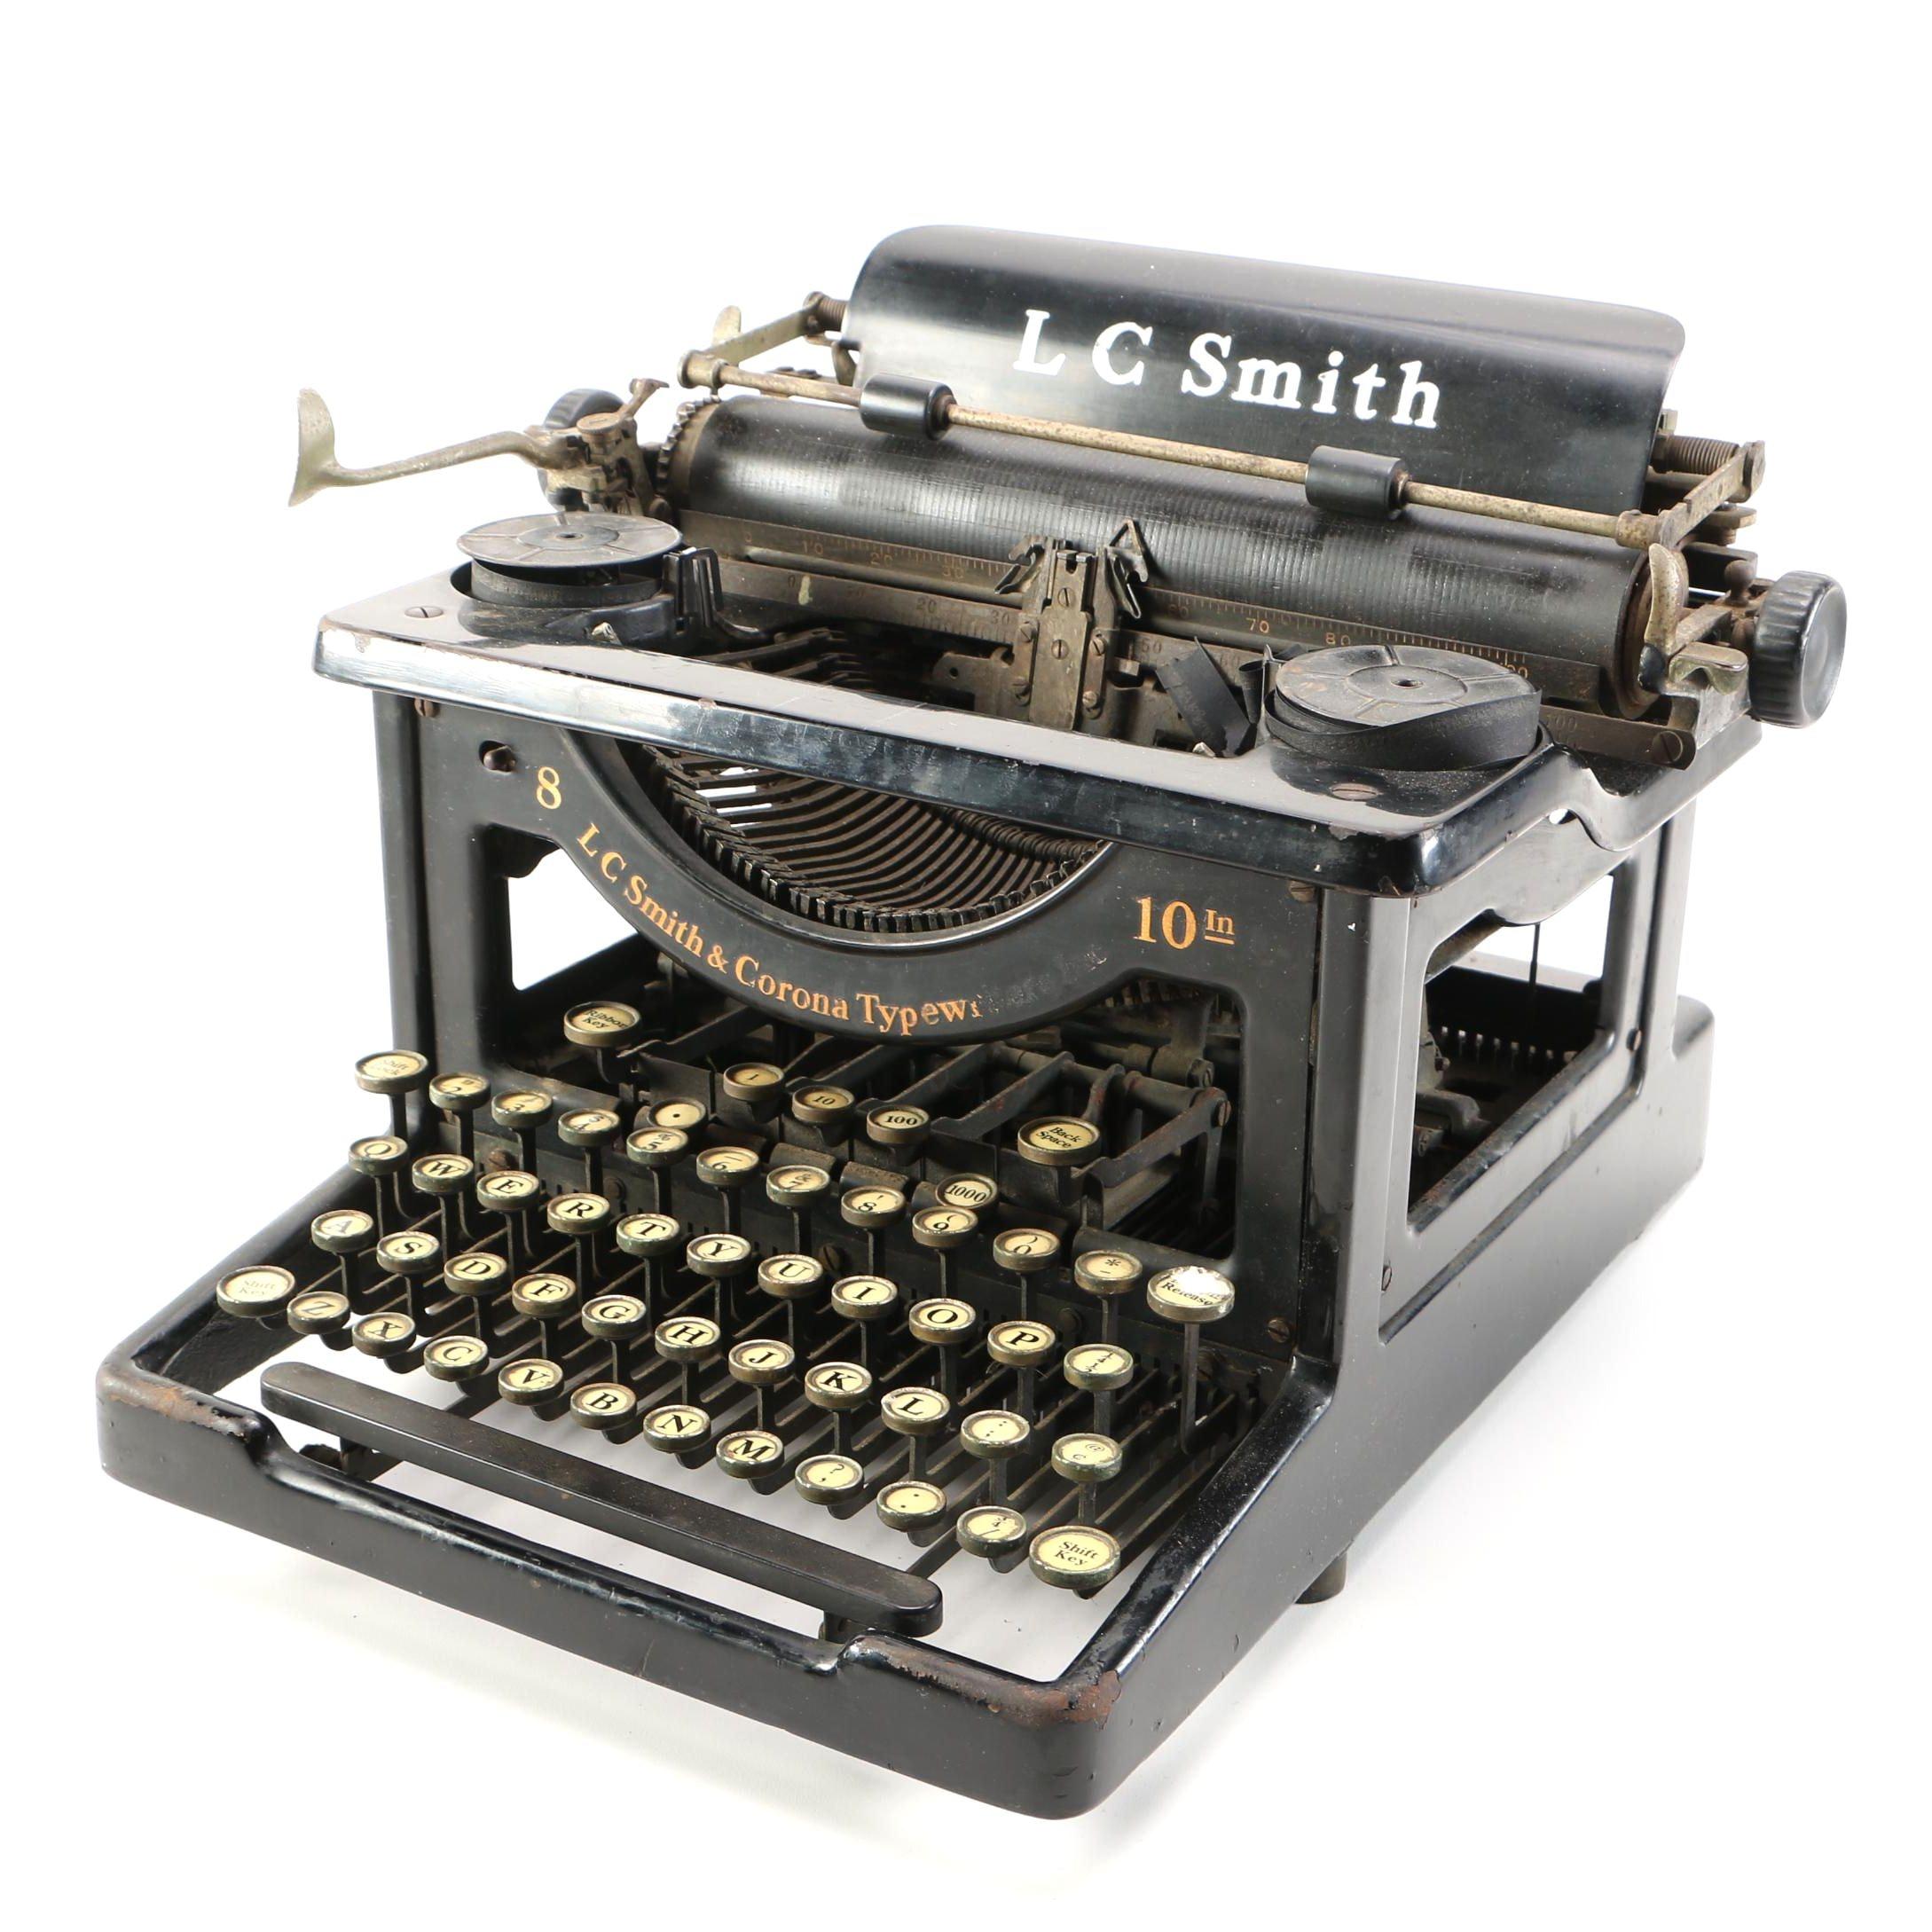 Vintage L.C. Smith 8-10 typewriter